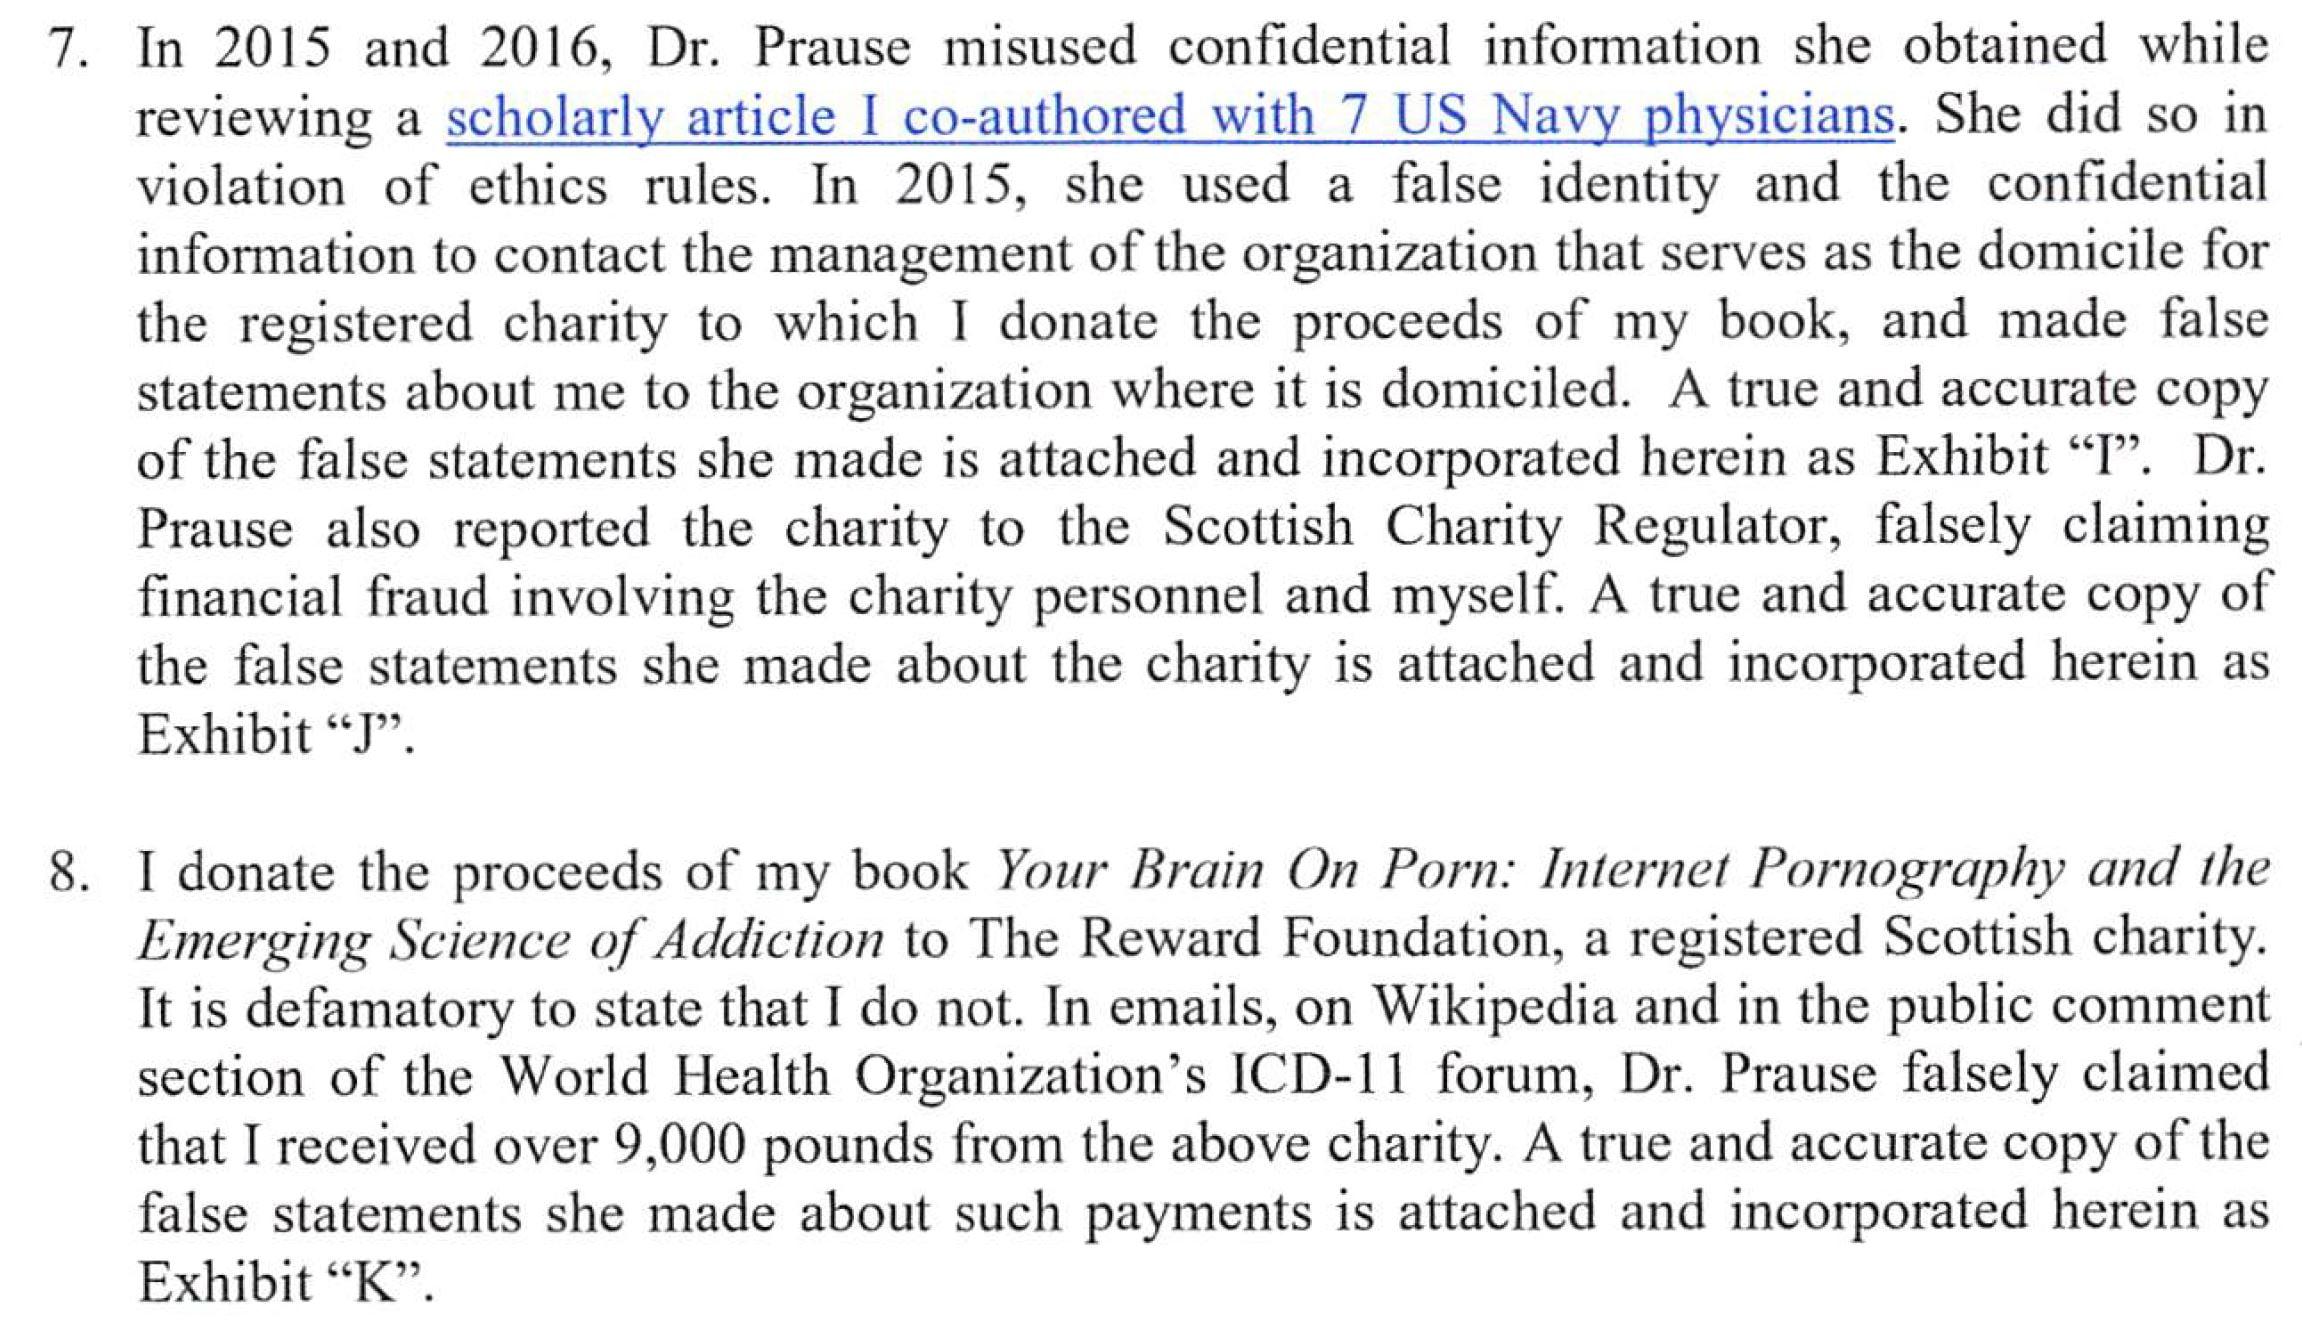 Nicole Prause's Harassment 2